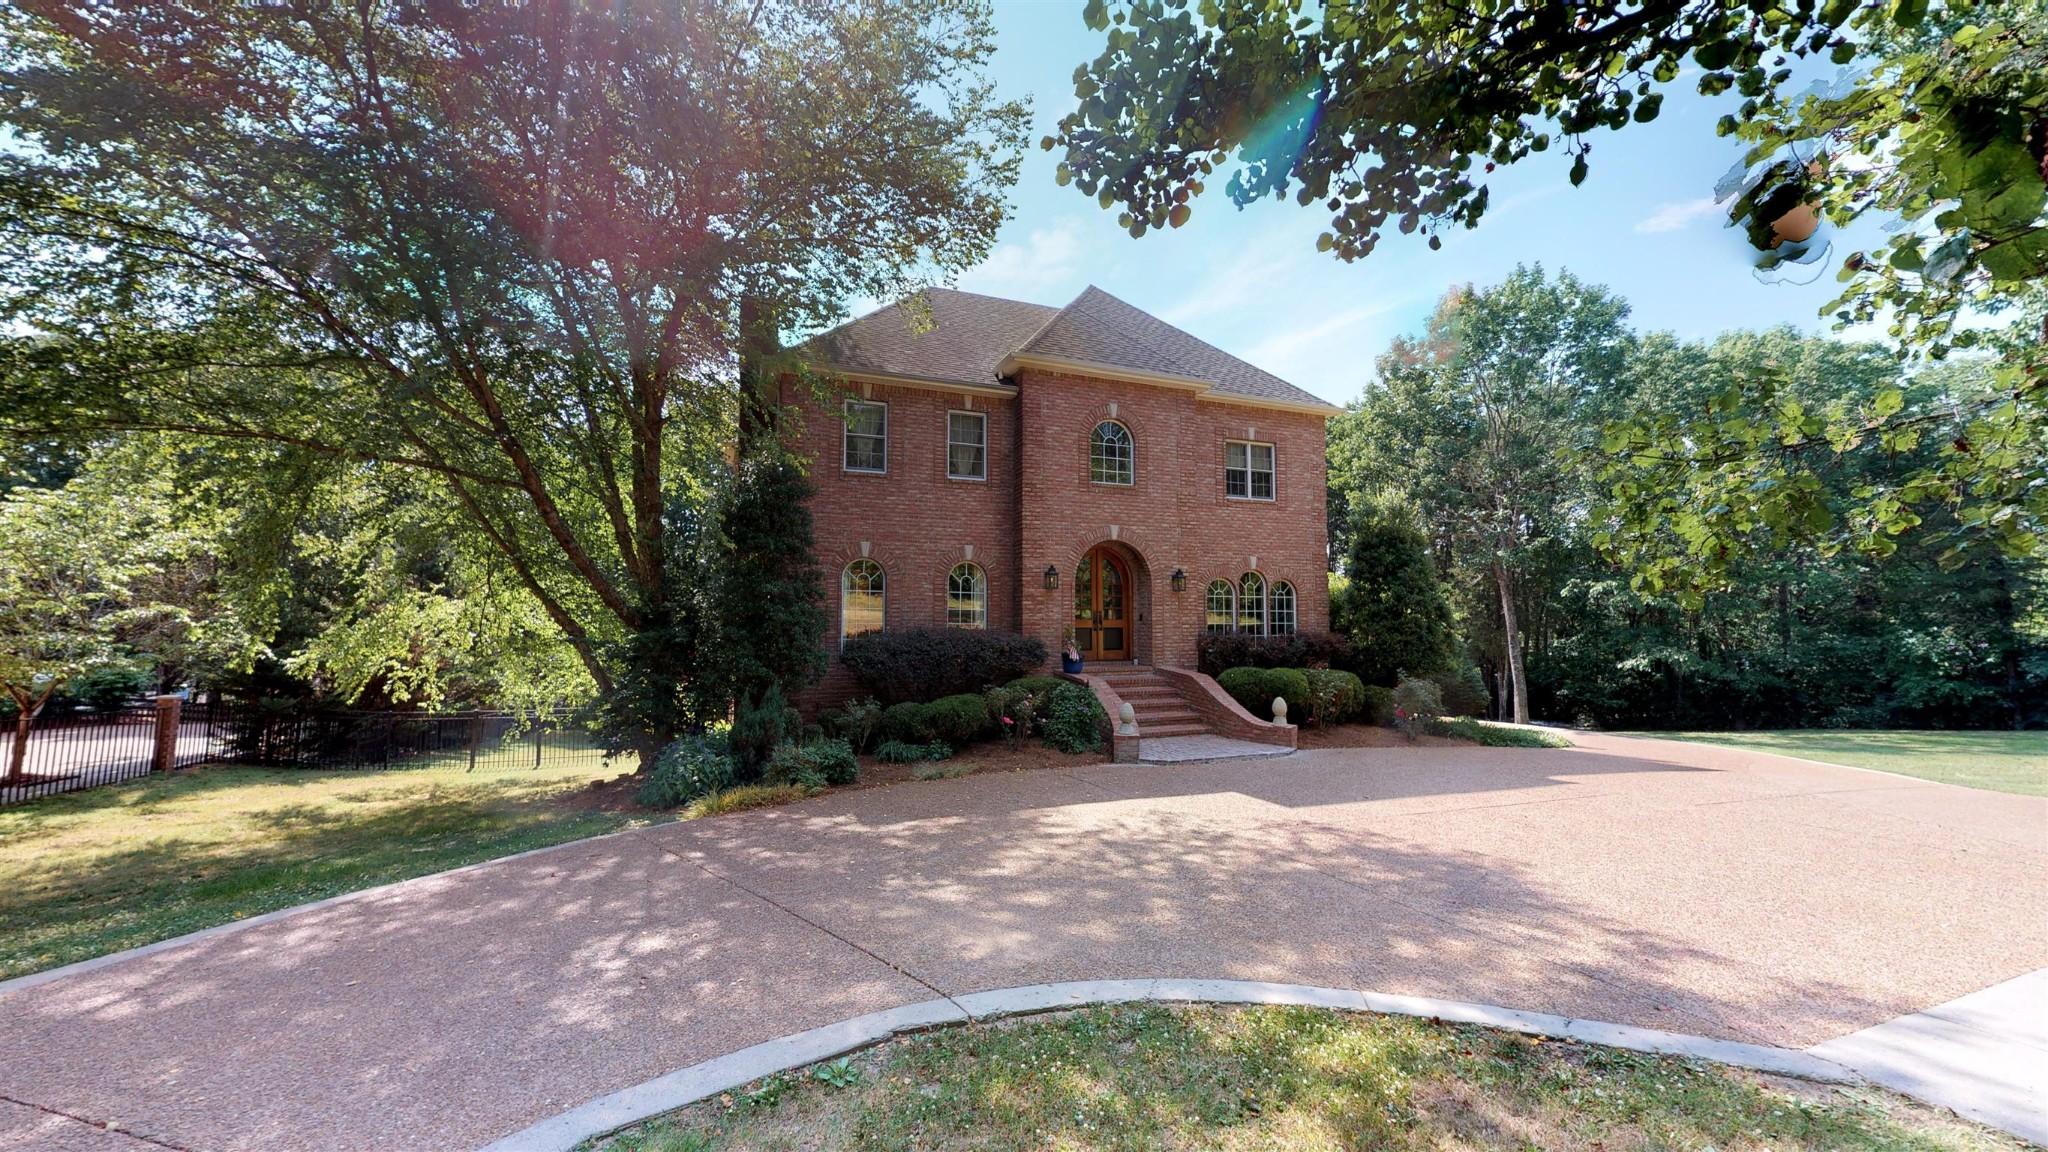 6064 Temple Rd, Nashville, TN 37221 - Nashville, TN real estate listing